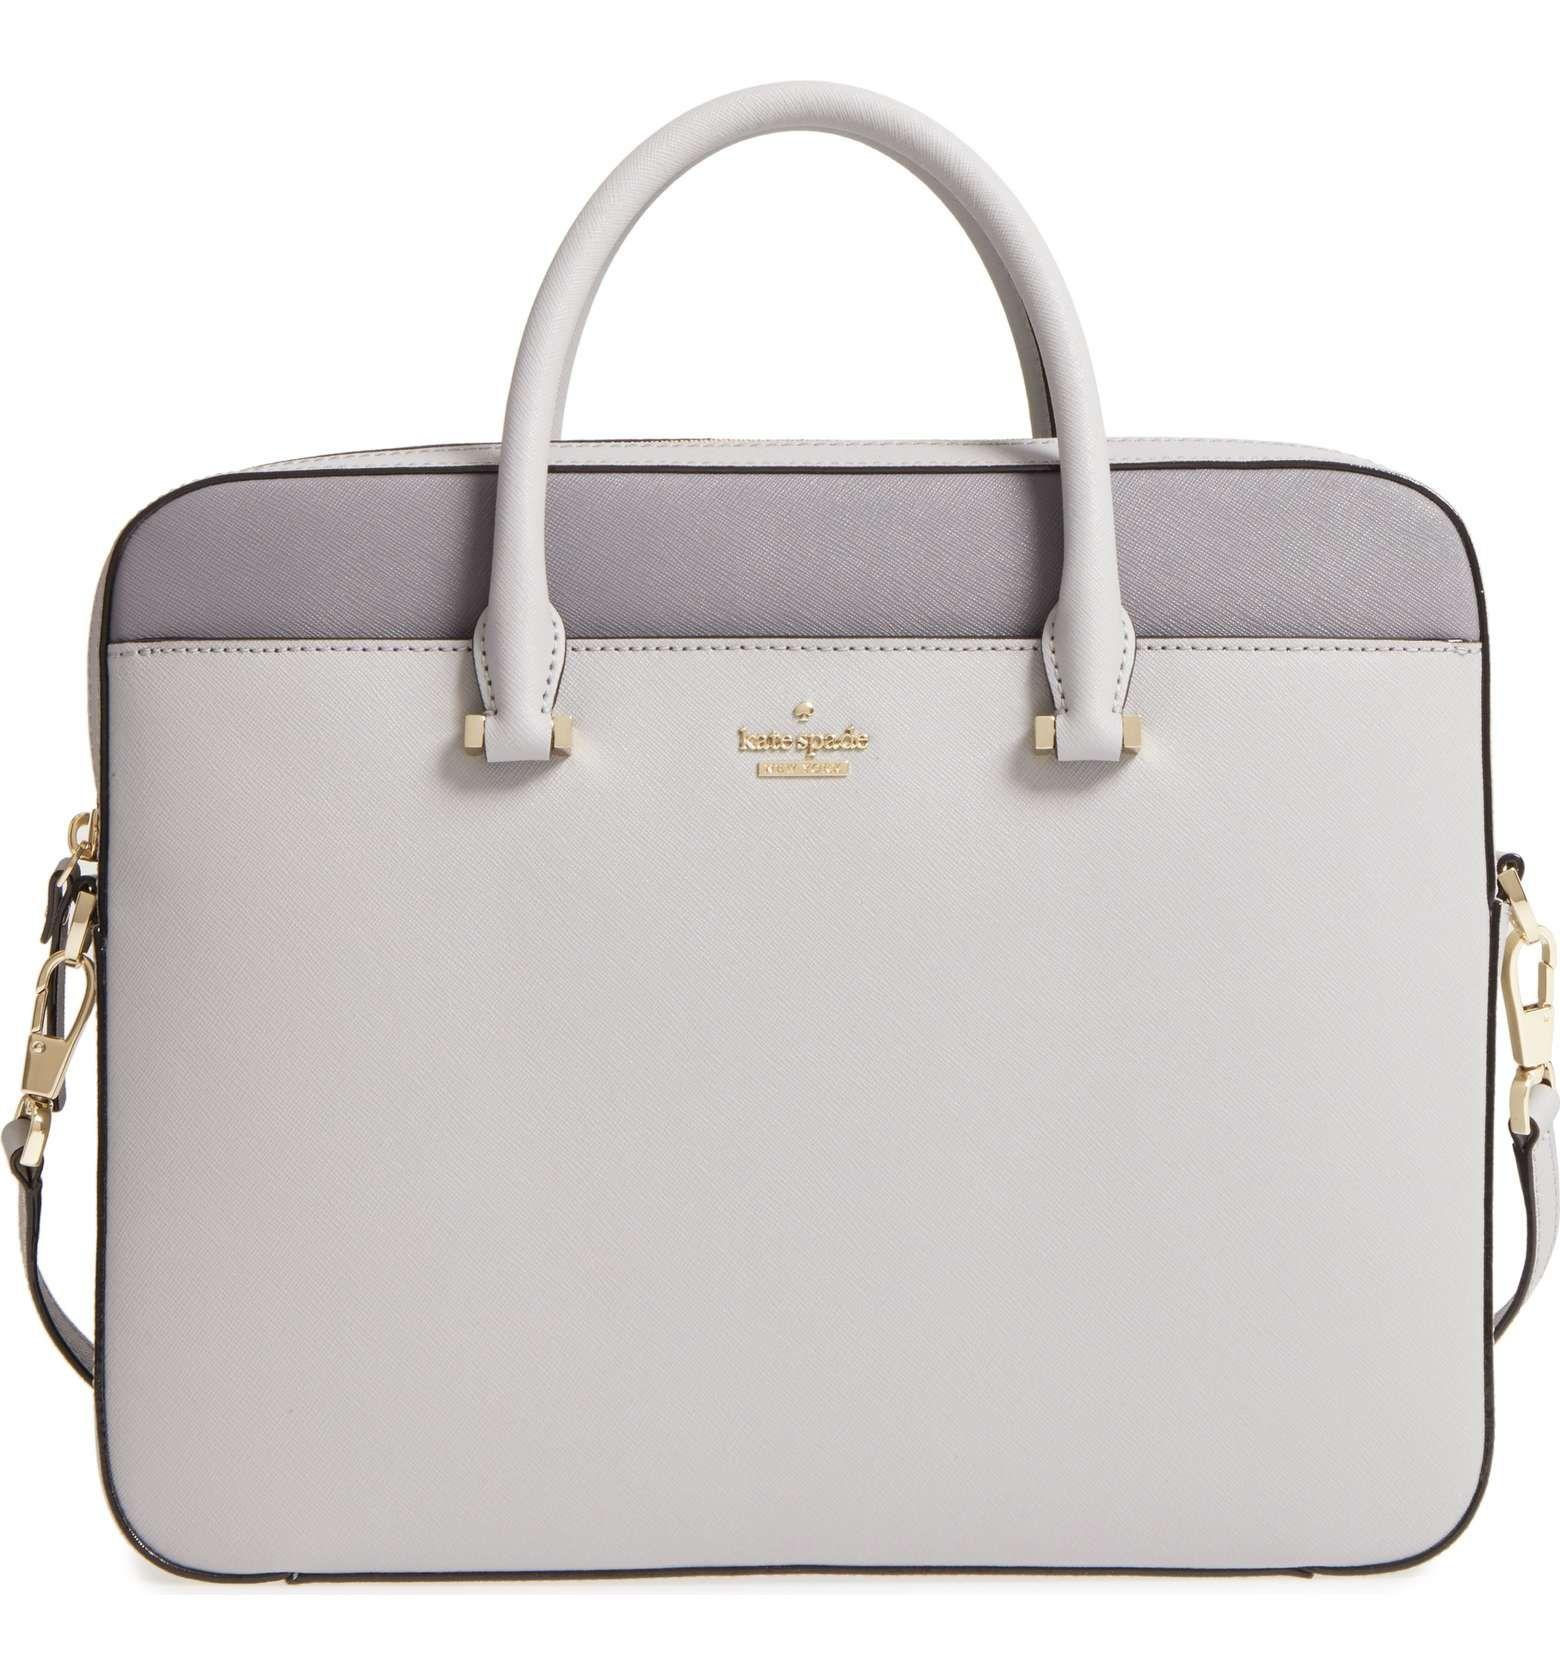 Briefcase stylish purse